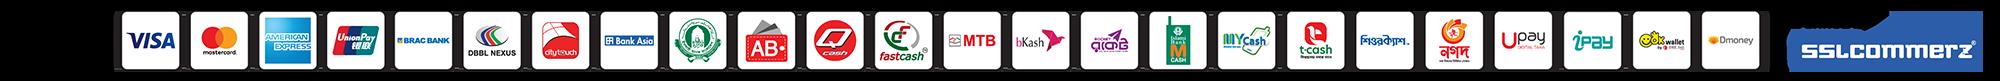 sslcommerz pay via visa bkash master card nagad rocket